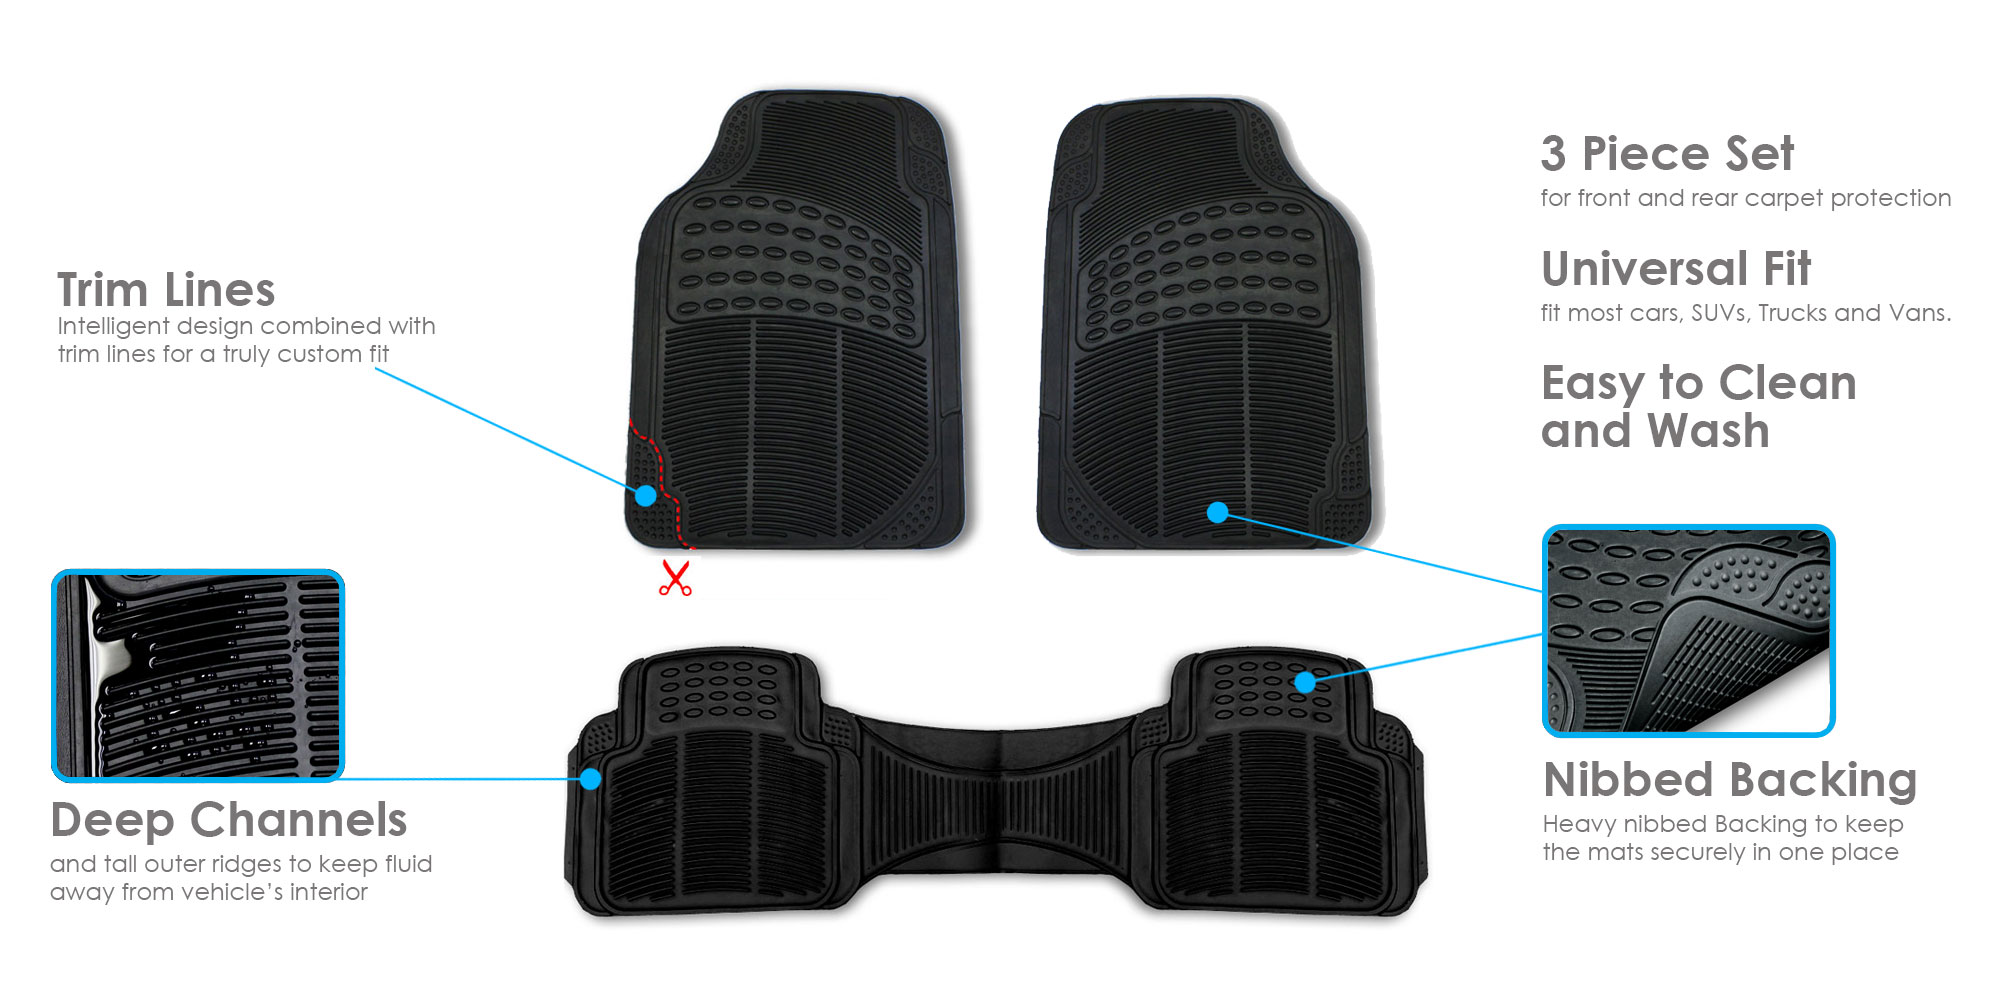 3pc-Floor-Mats-for-Auto-Car-SUV-Van-Heavy-Duty-3-Colors-w-Free-Gift thumbnail 9